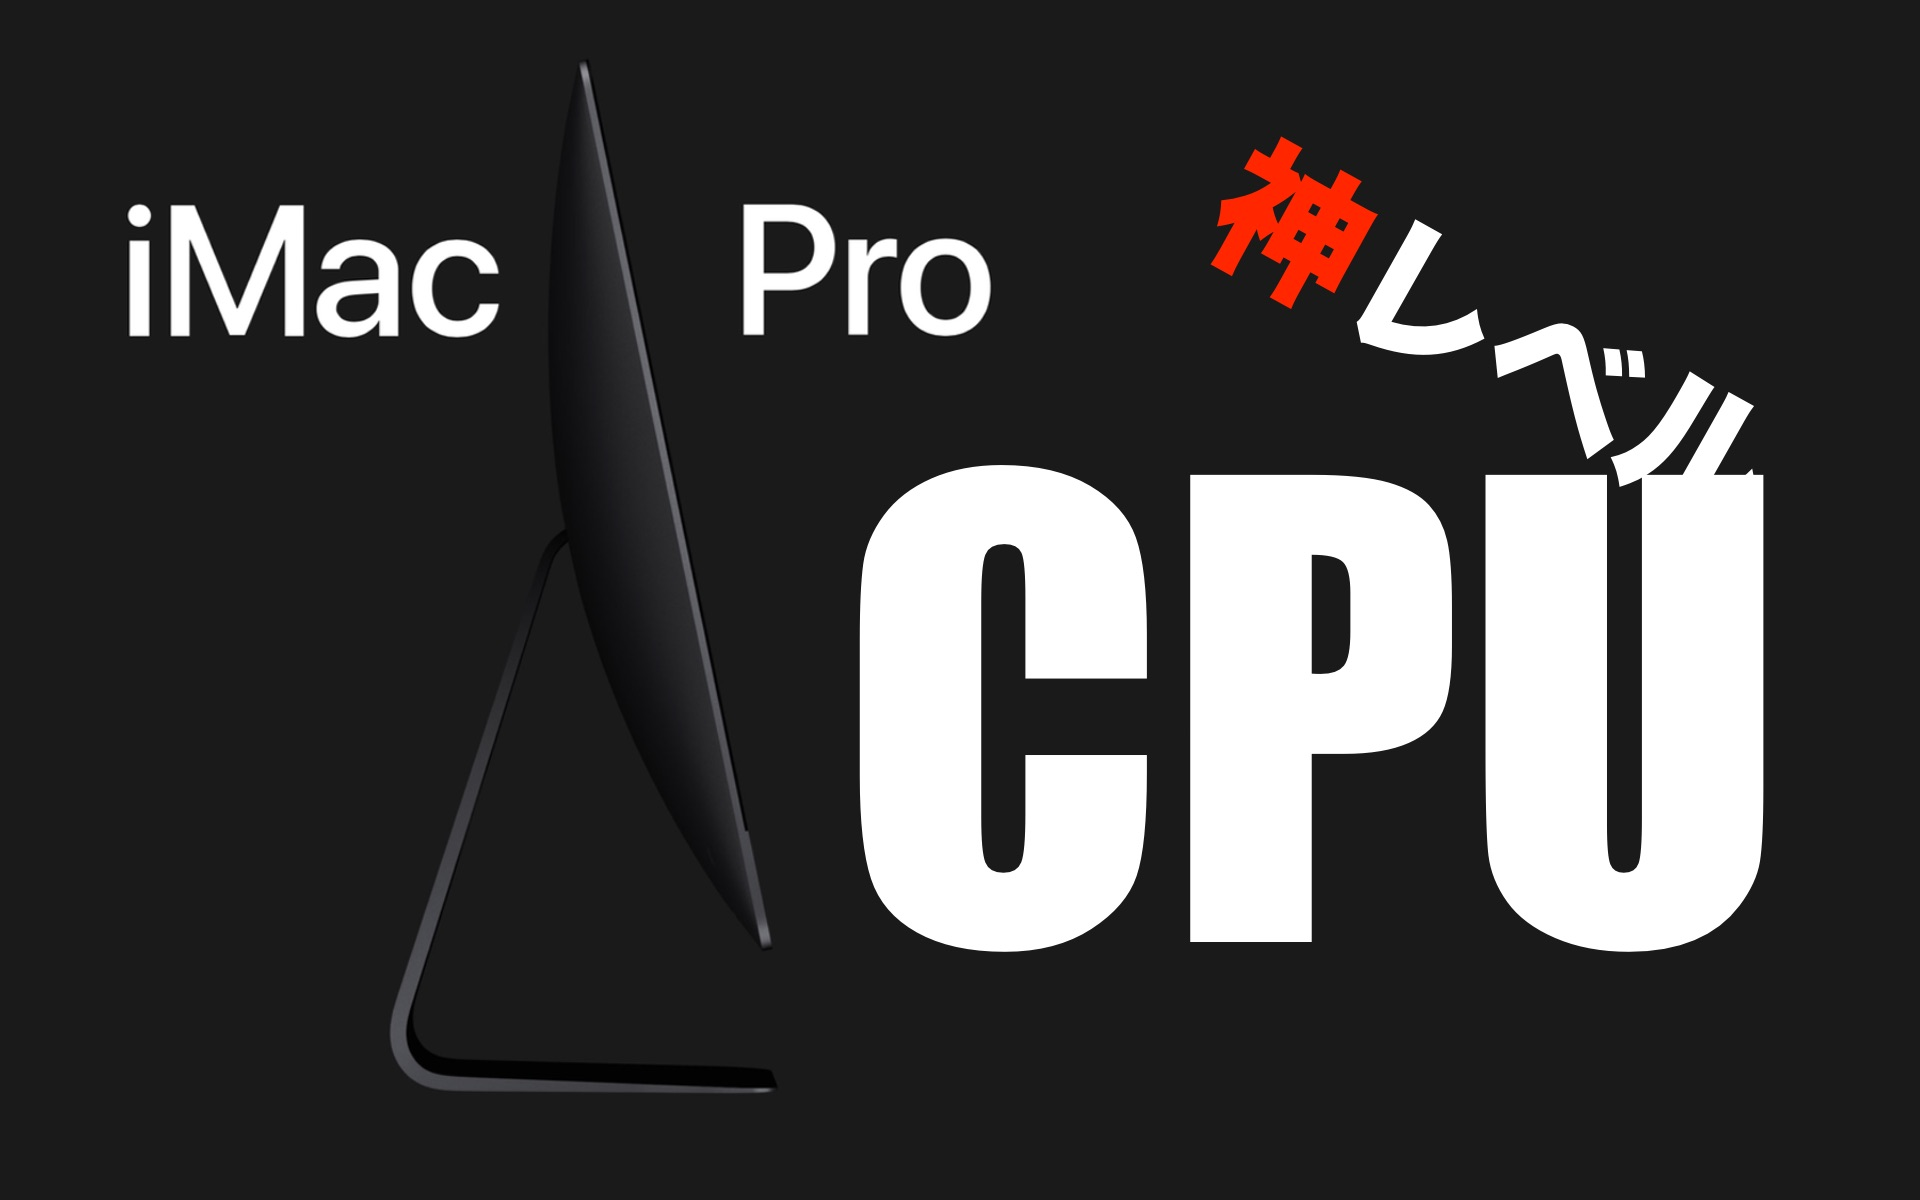 iMac Pro CPUの記事のアイキャッチ